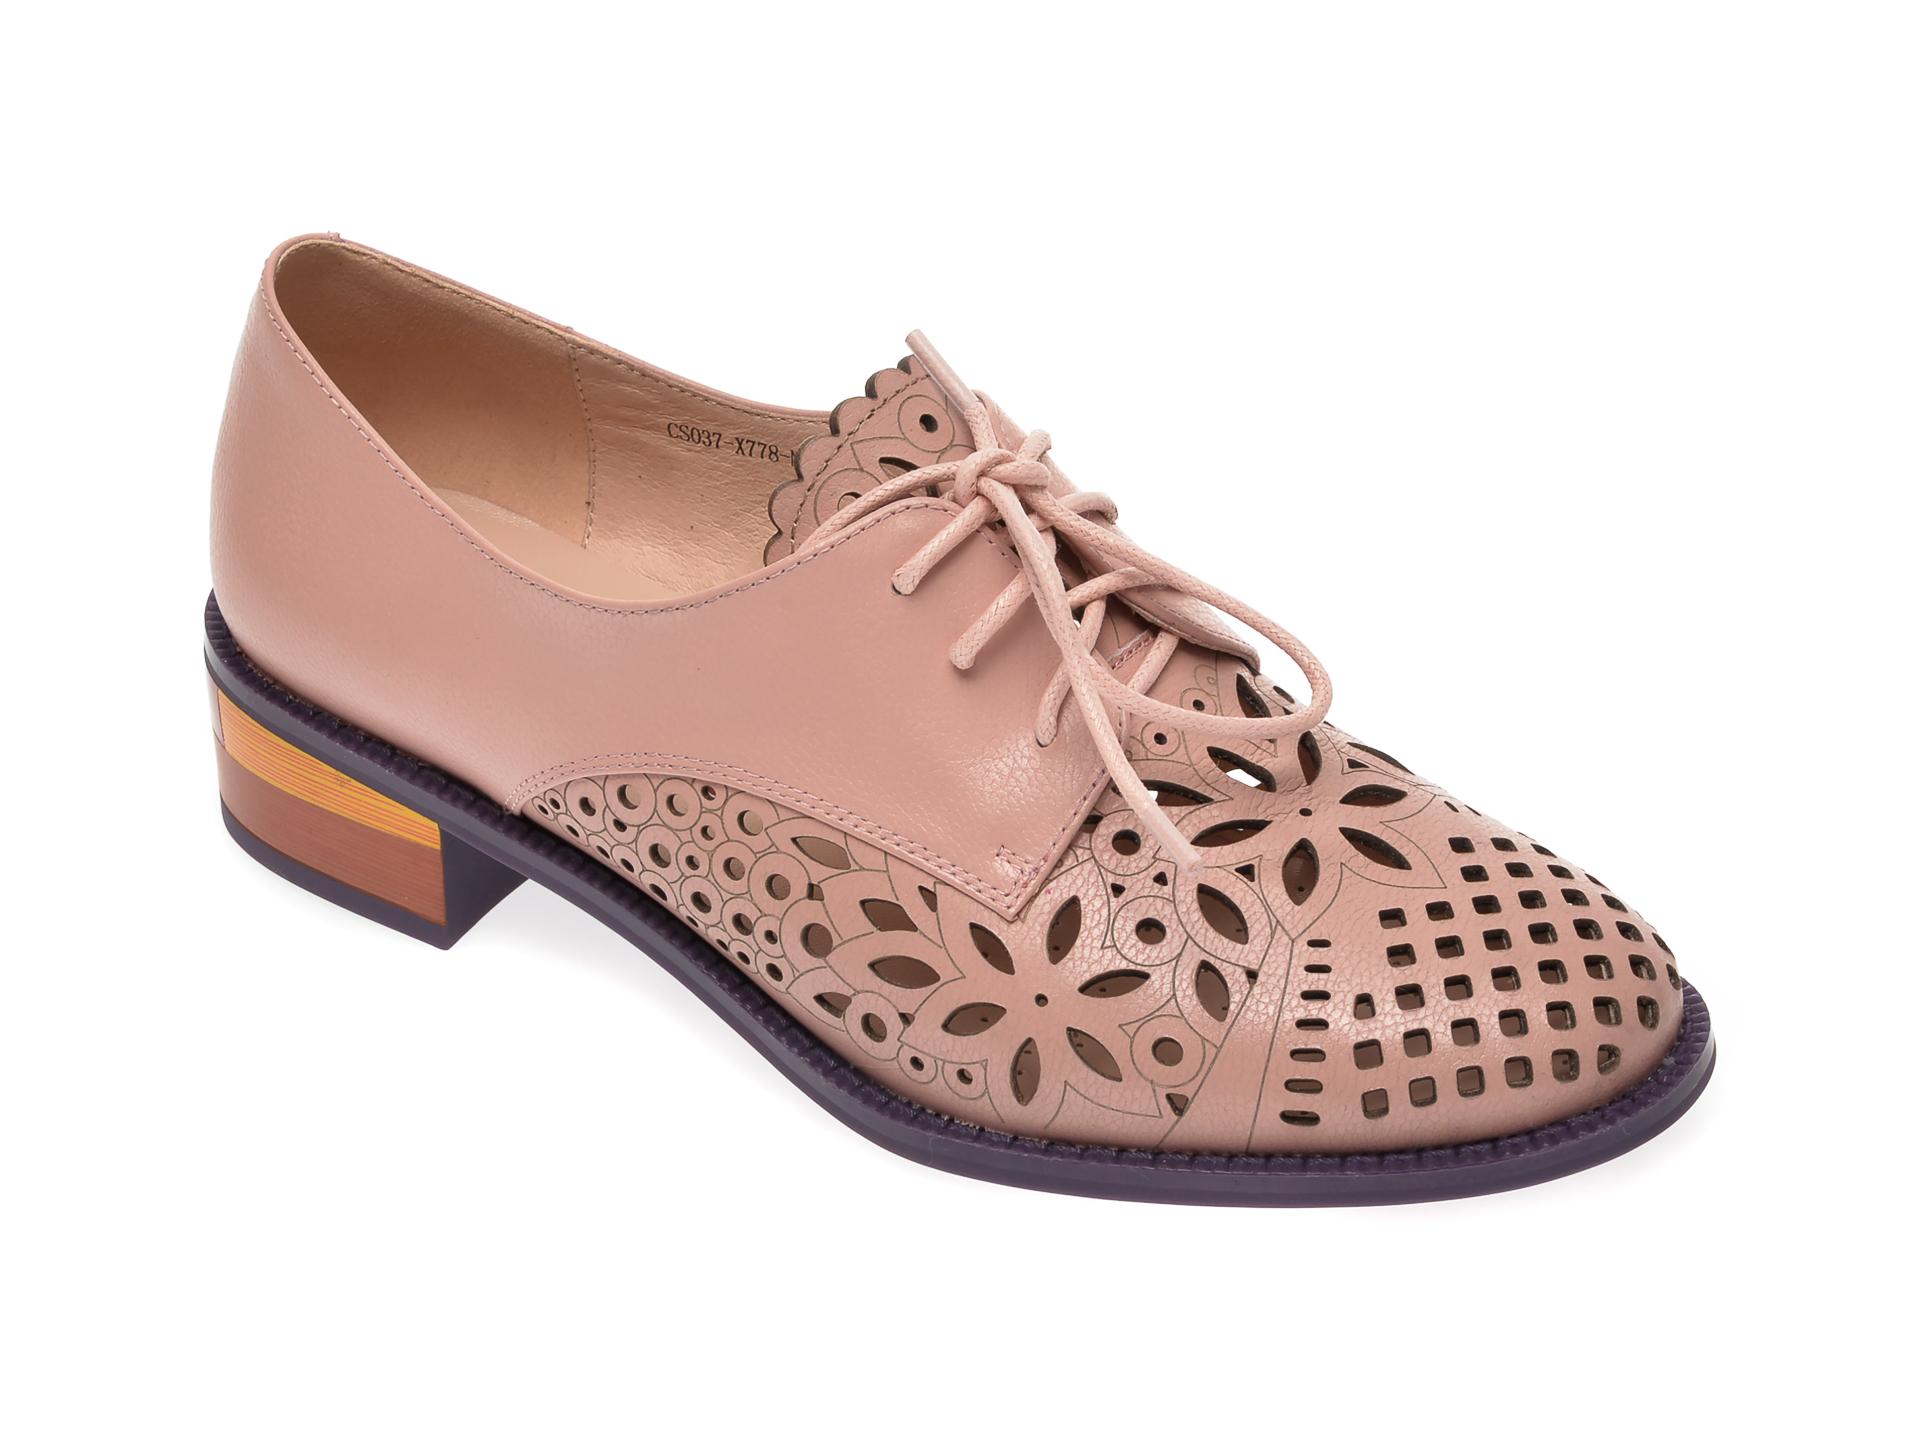 Pantofi vara IMAGE roz, CS037X7, din piele naturala